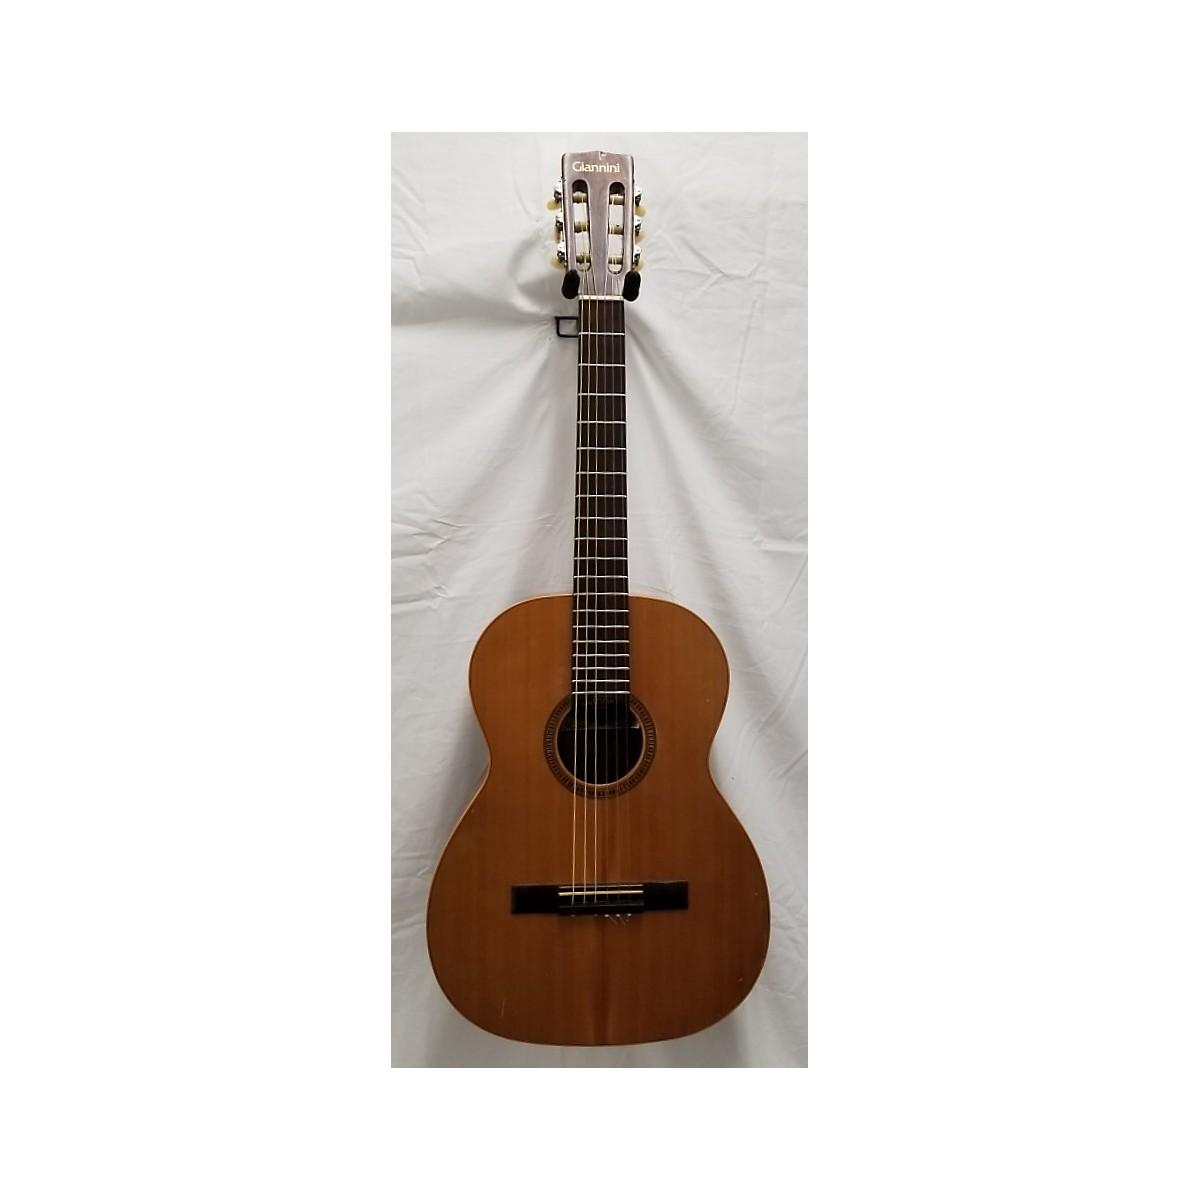 Giannini 1970s Classical Guitar Classical Acoustic Guitar